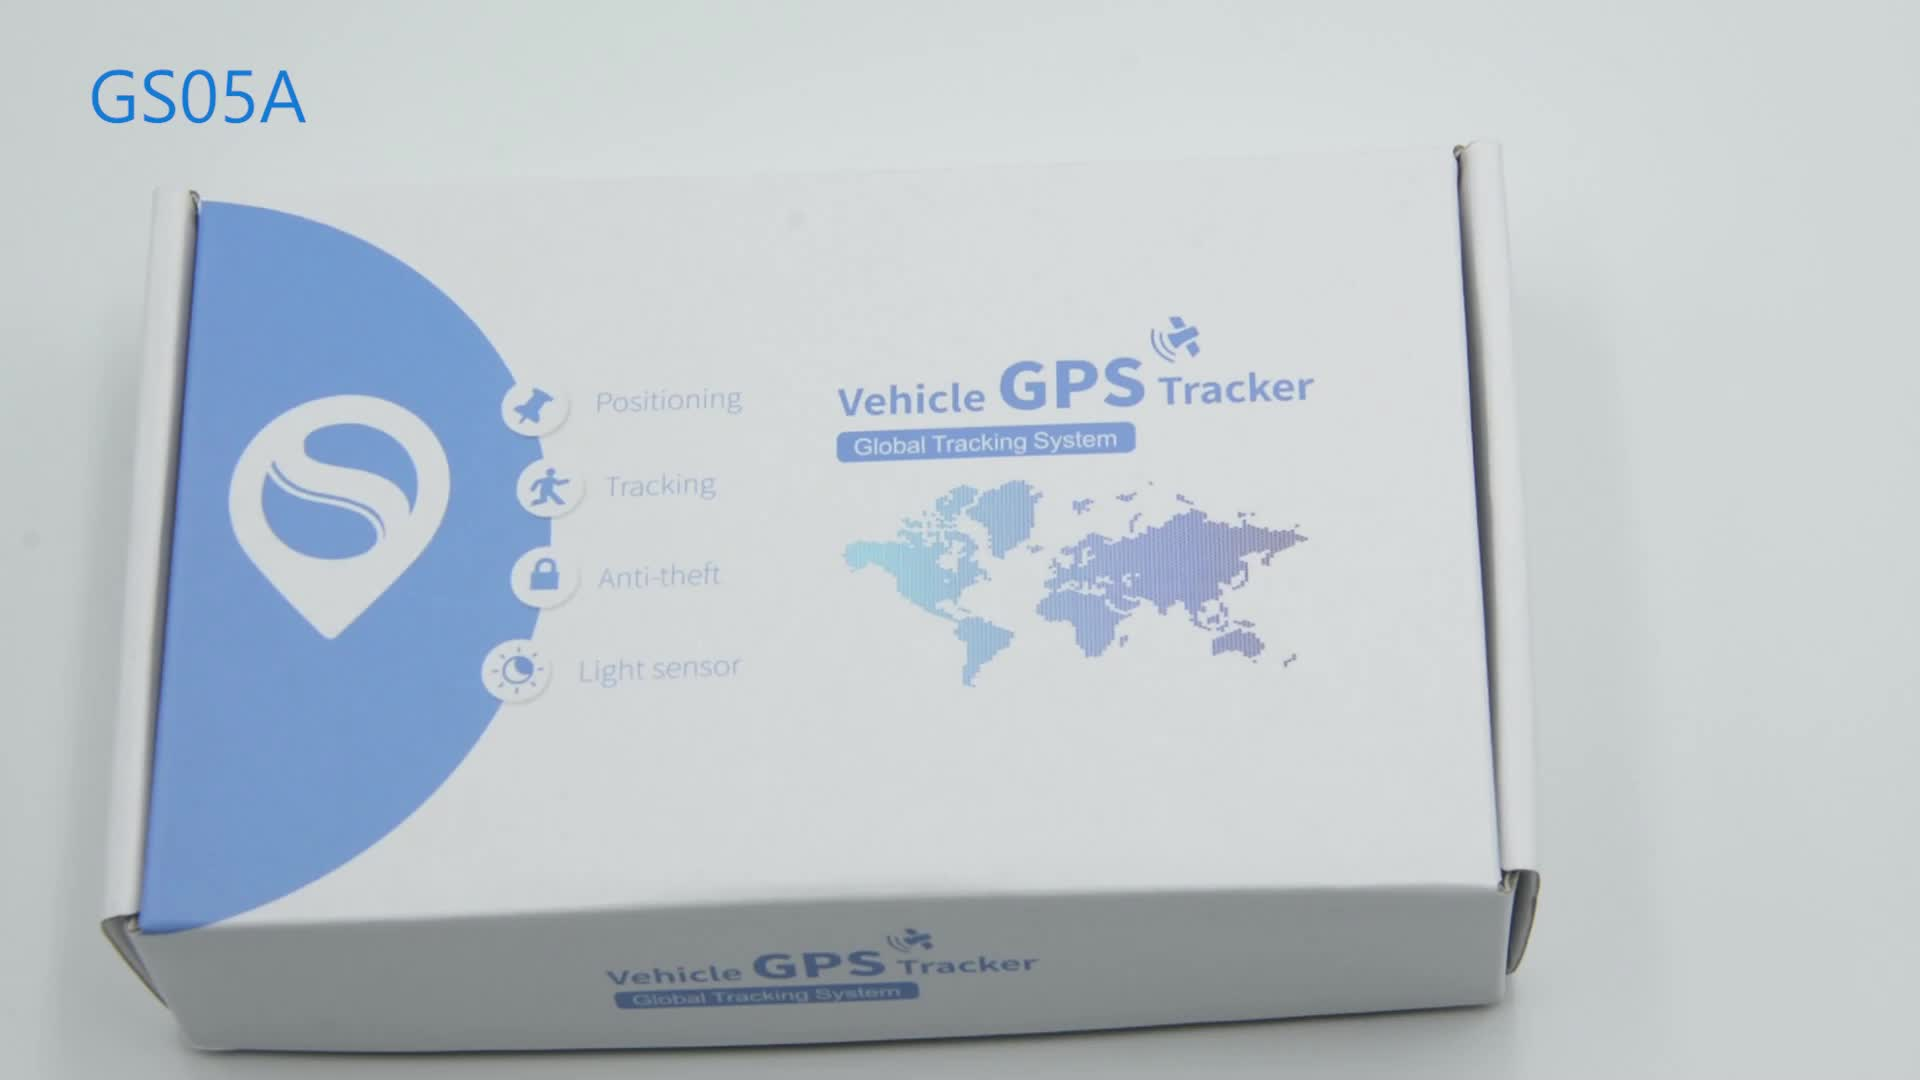 Goome GS05A จักรยานอุปกรณ์ติดตาม Mirco อุปกรณ์ติดตาม GPS สำหรับรถจักรยานยนต์ขนาดเล็กอุปกรณ์ GPS Global Tracker